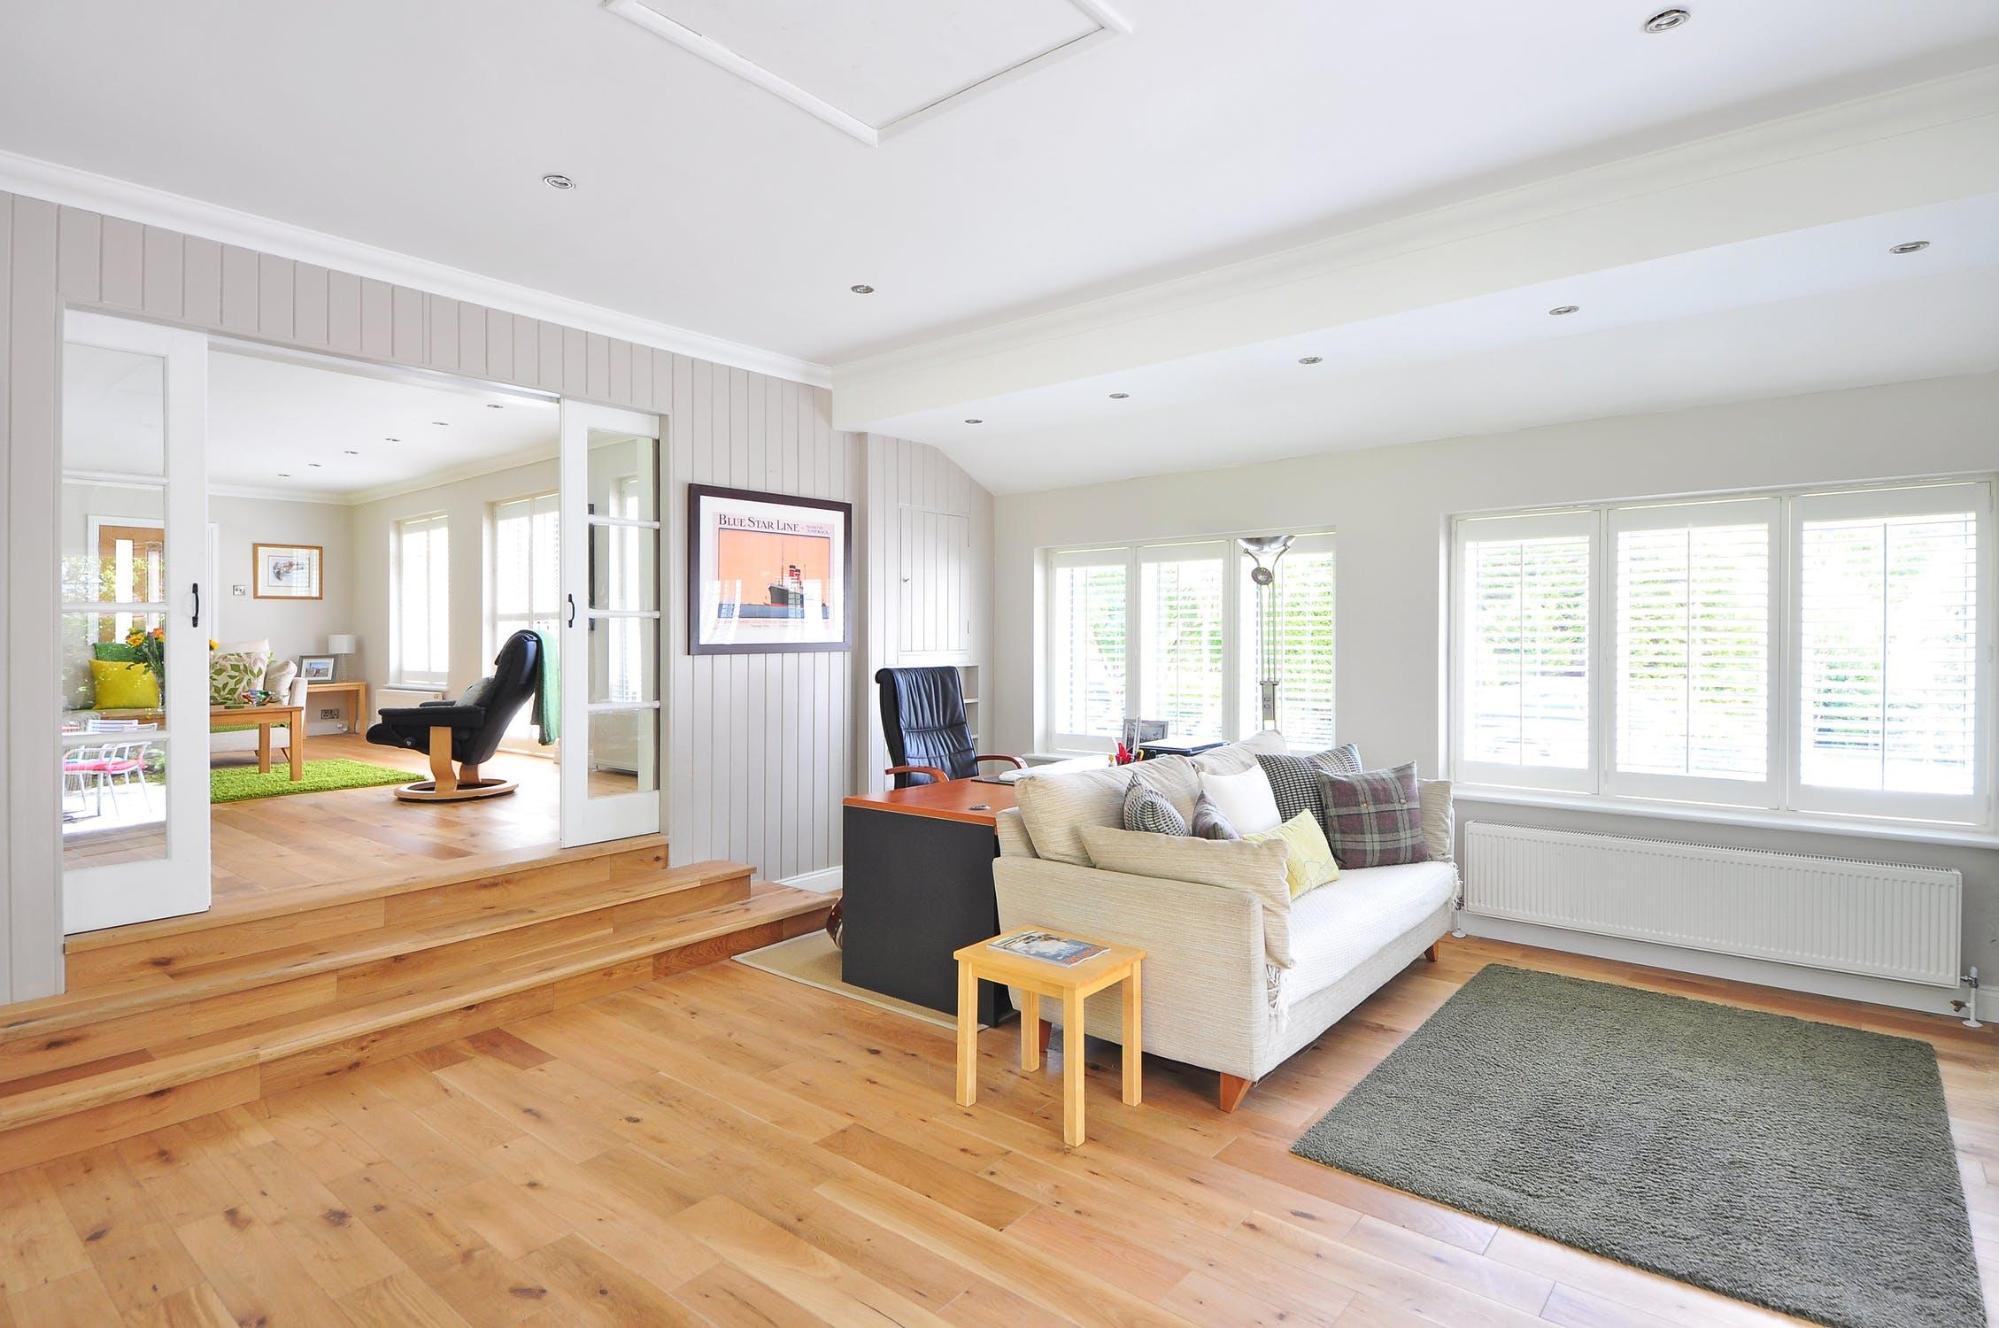 particular indoor and outdoor spaces